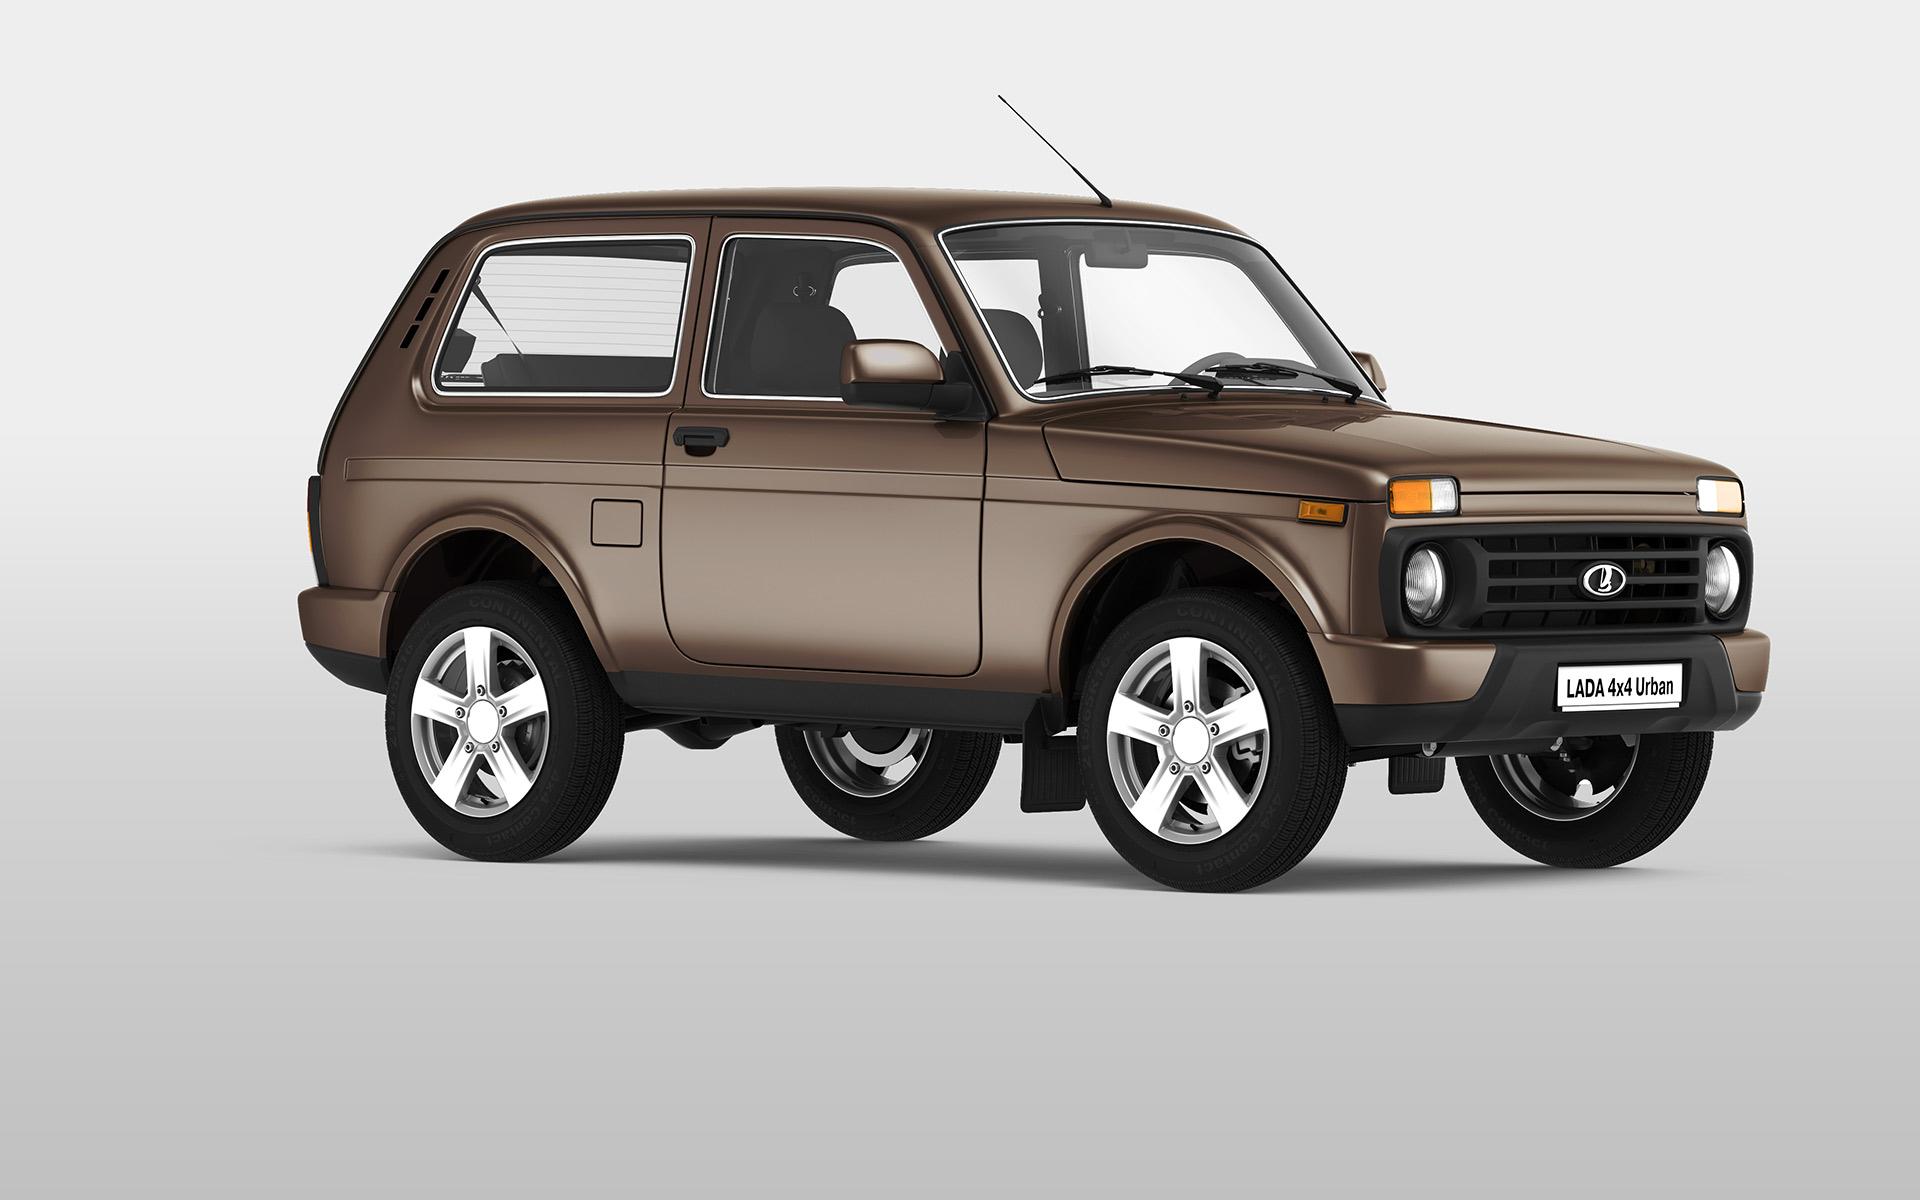 Lada 4x4 Urban Review Lada Official Website